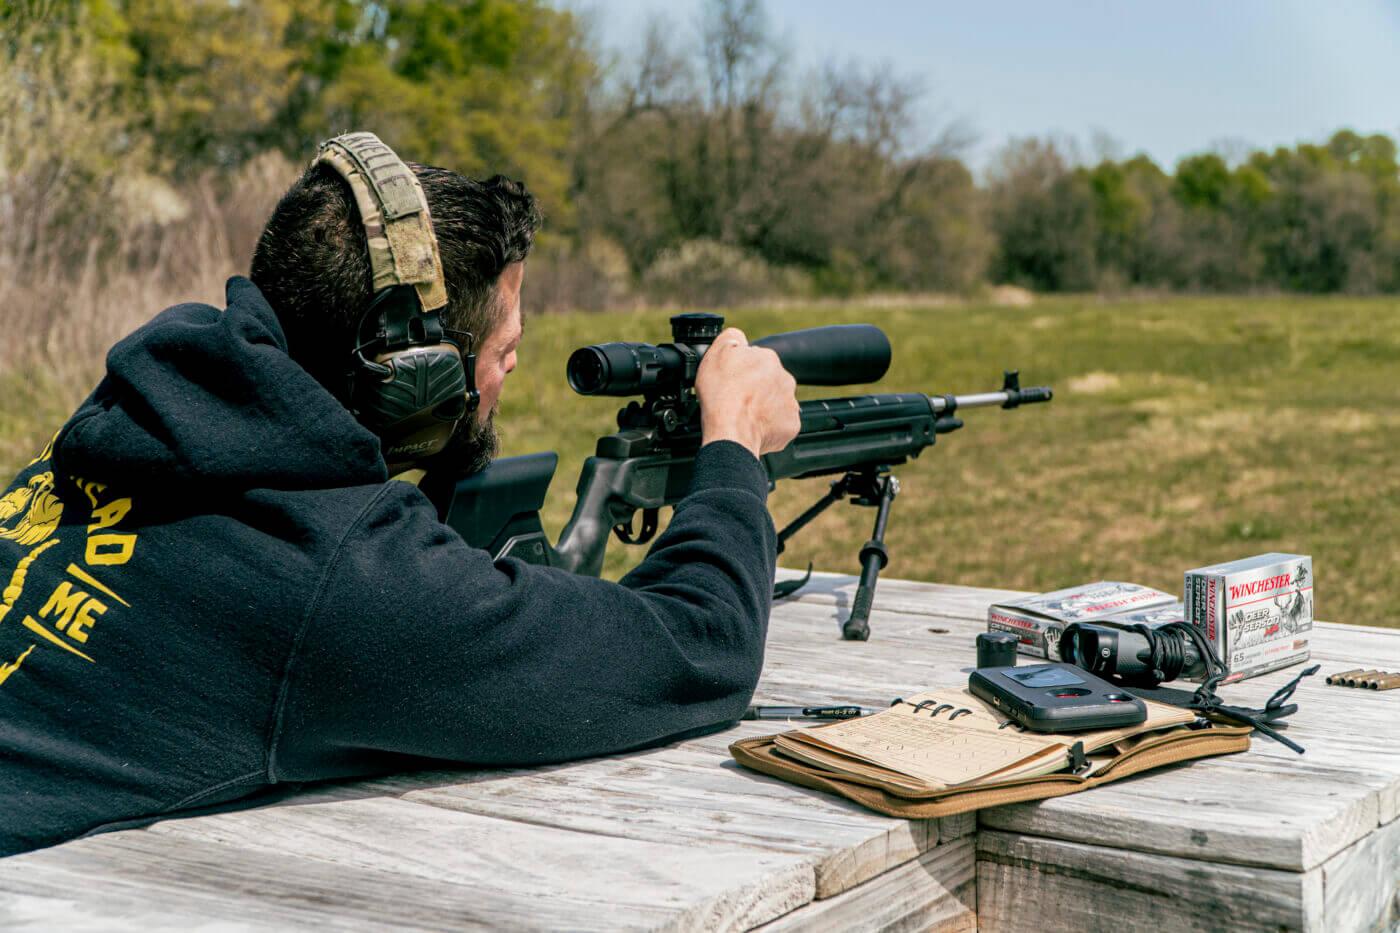 Testing the FDN 25X on the range